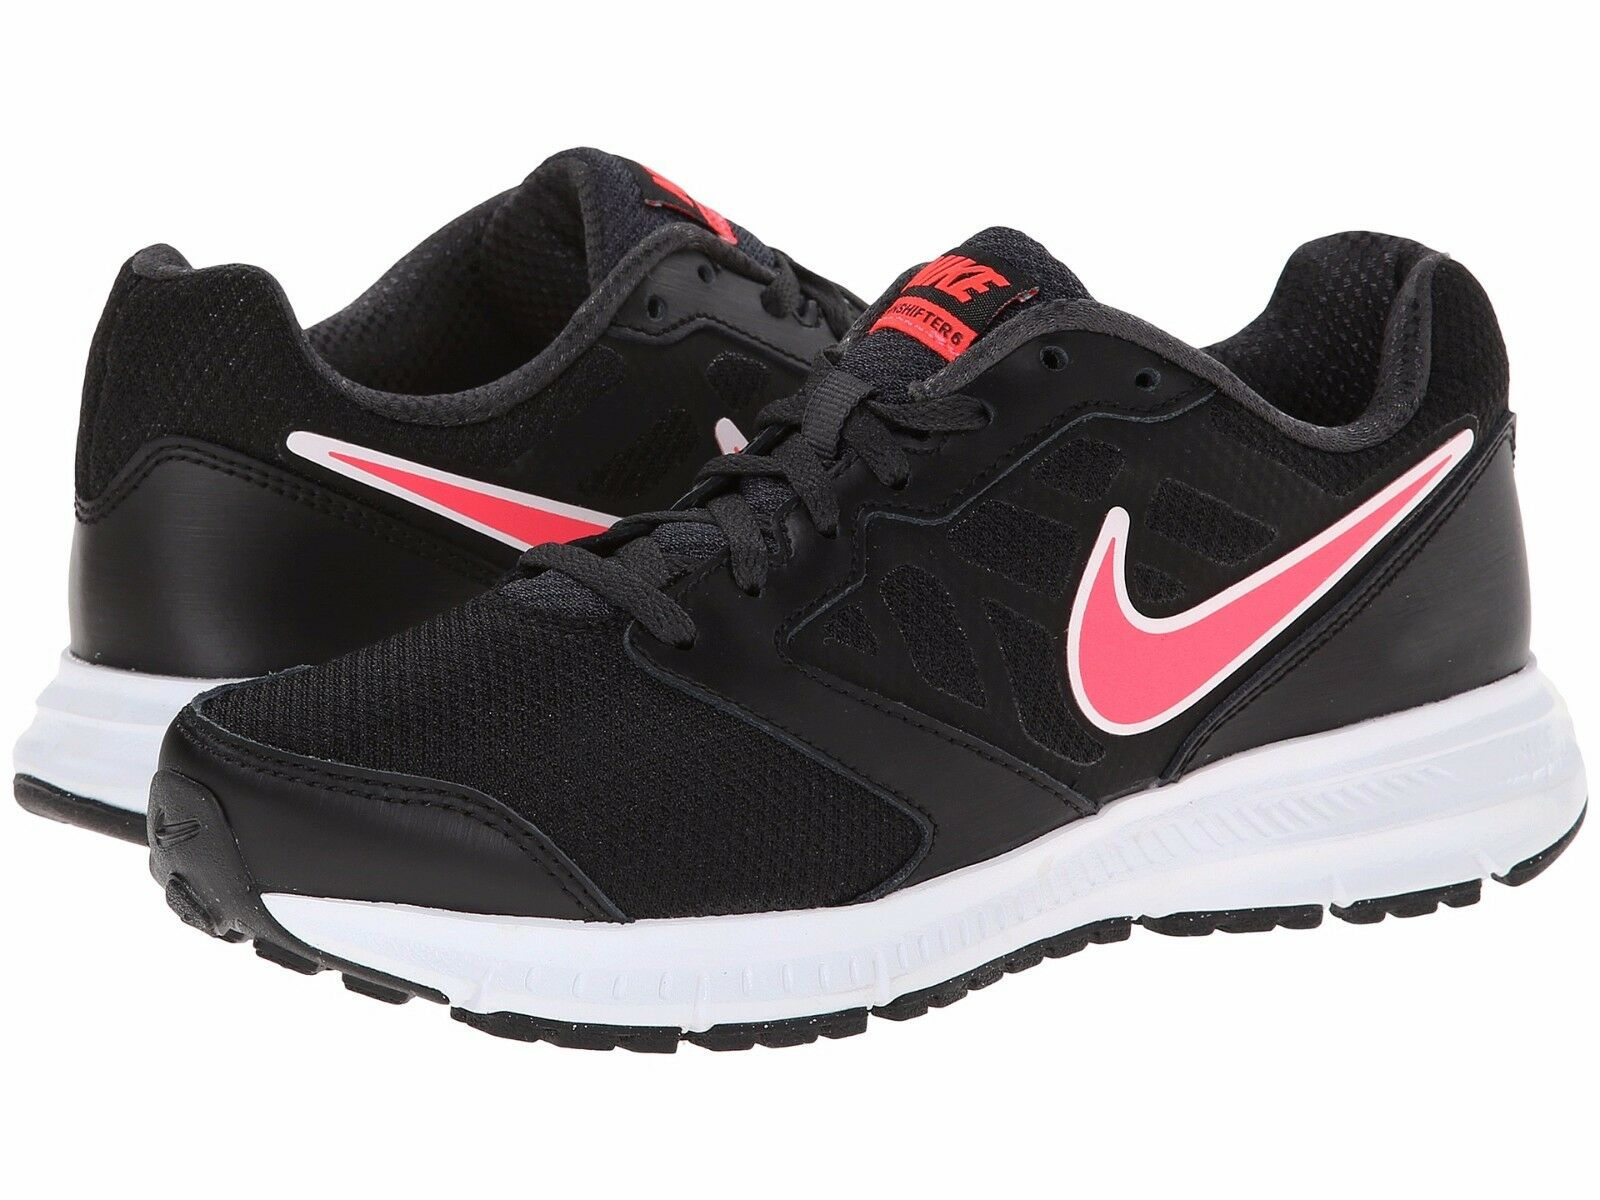 Nike Women's Downshifter 6 Running Shoes, 684765 002 Sizes 5-10 Black/Hyper Punc